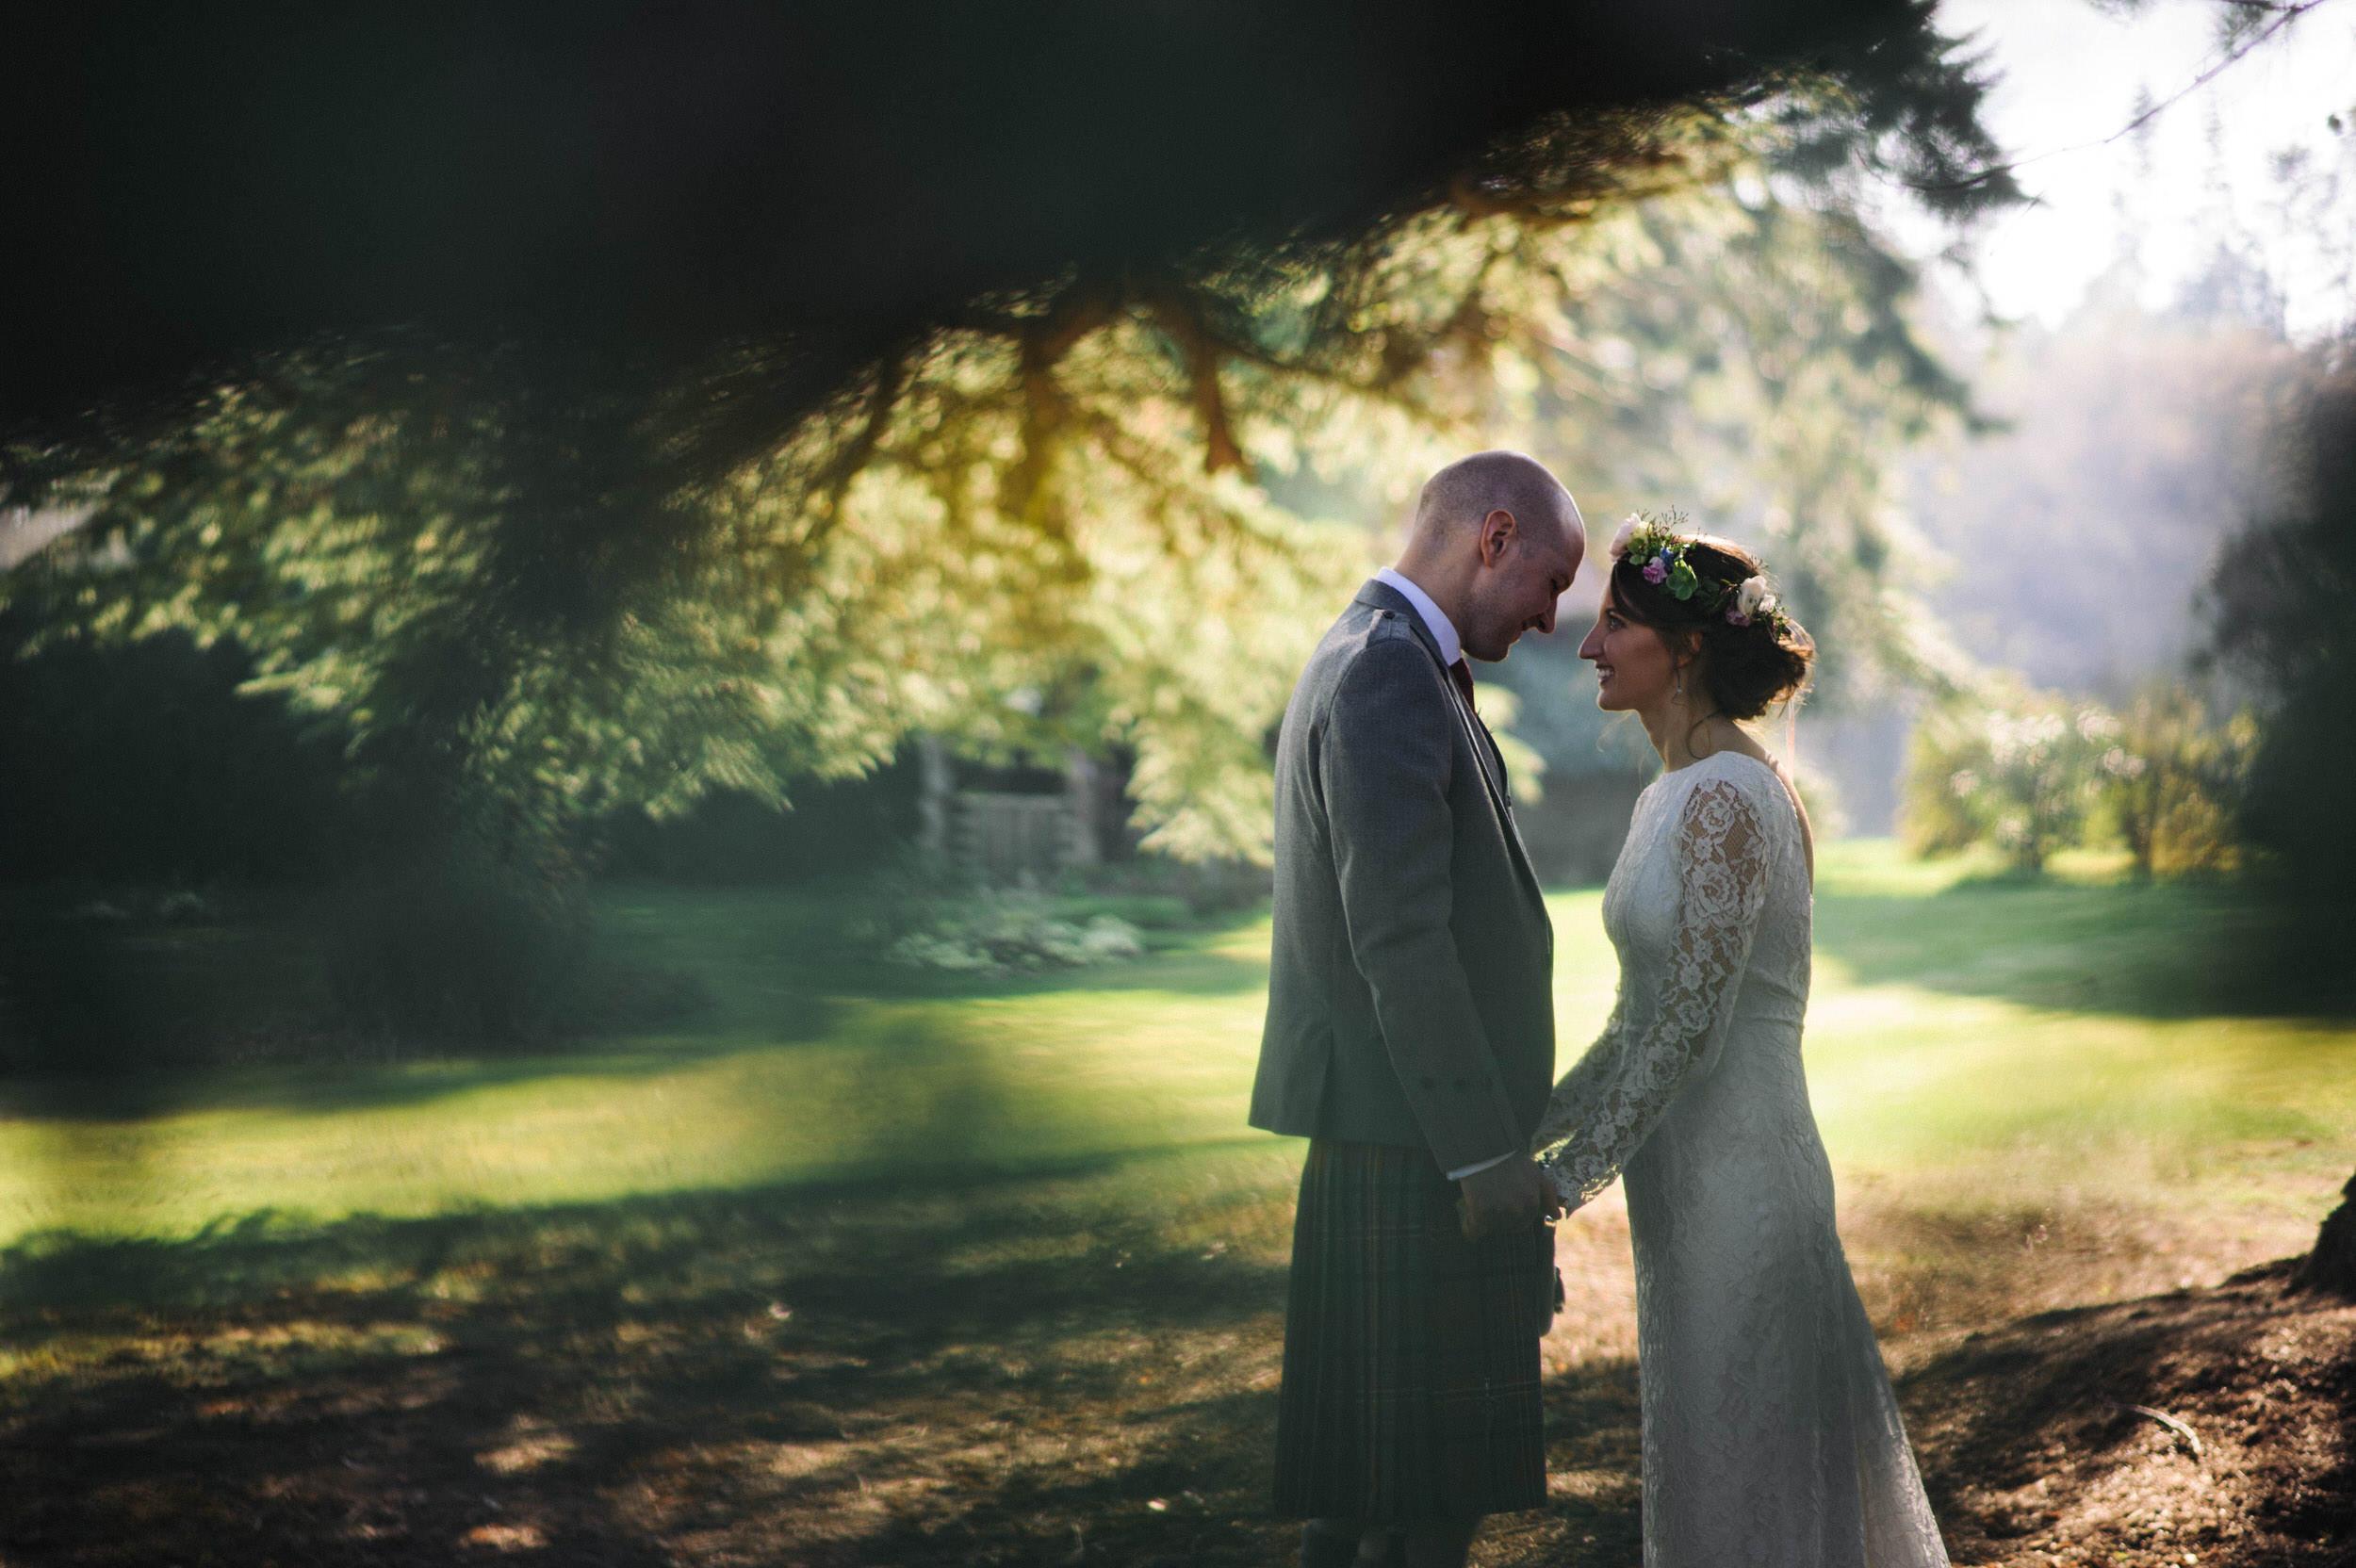 Quirky Natural Wedding Photographer Errol Park 061.jpg